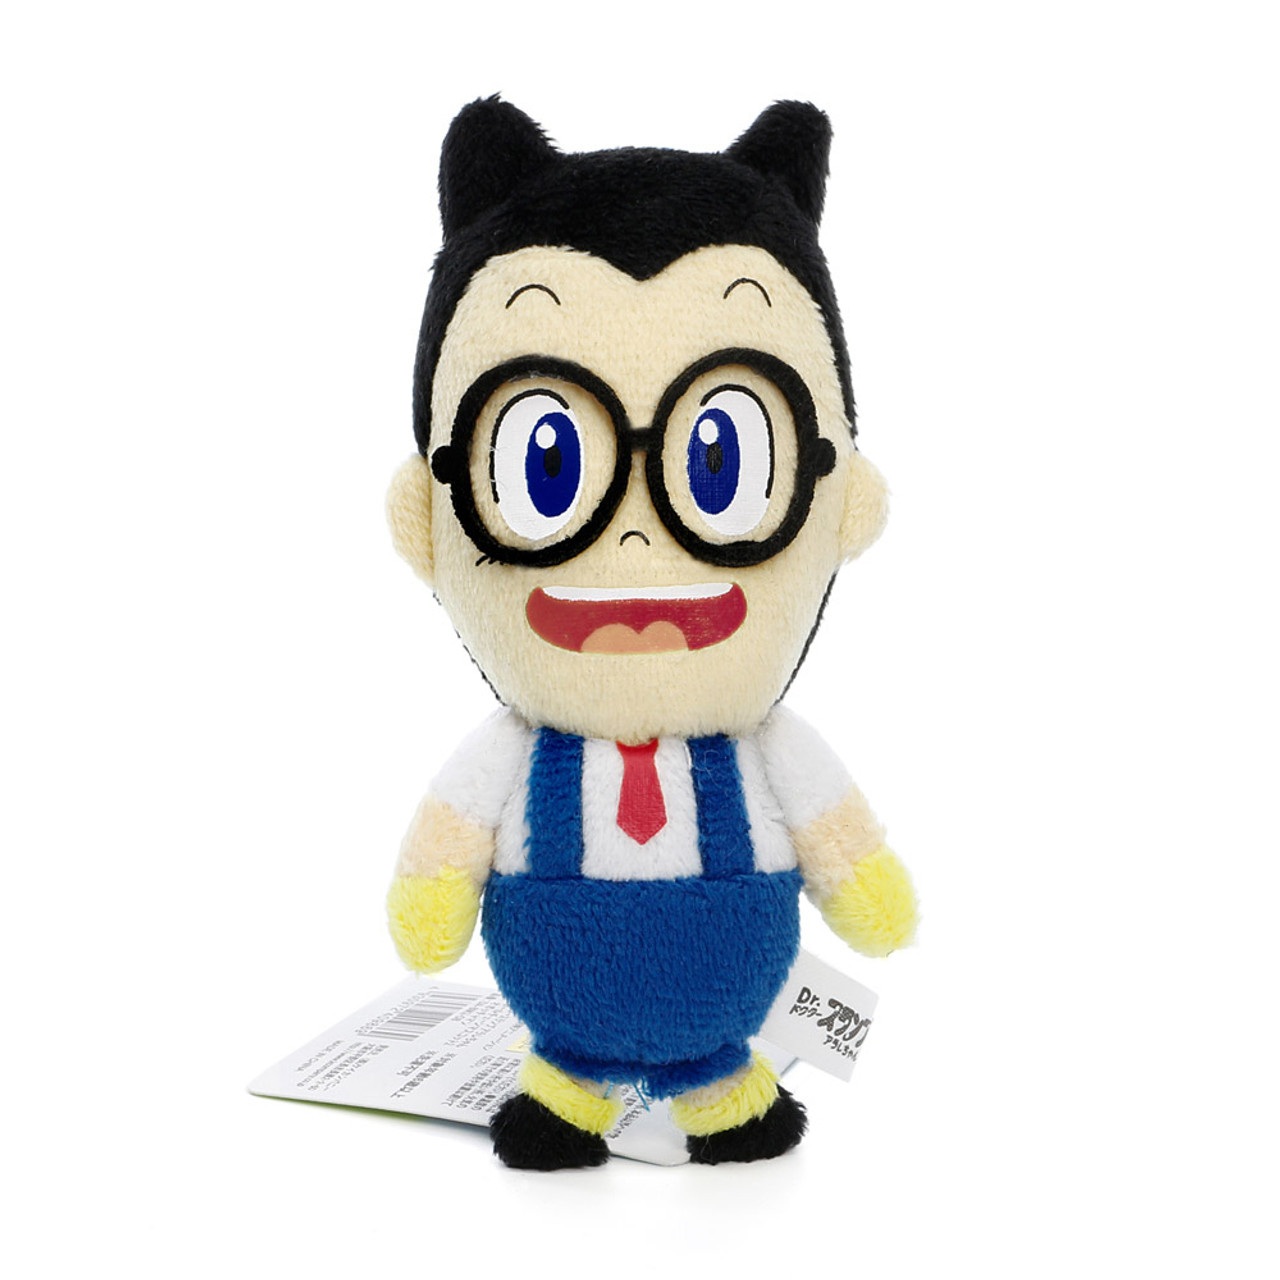 Obotchaman Mascot Plush Charms ( Front View )